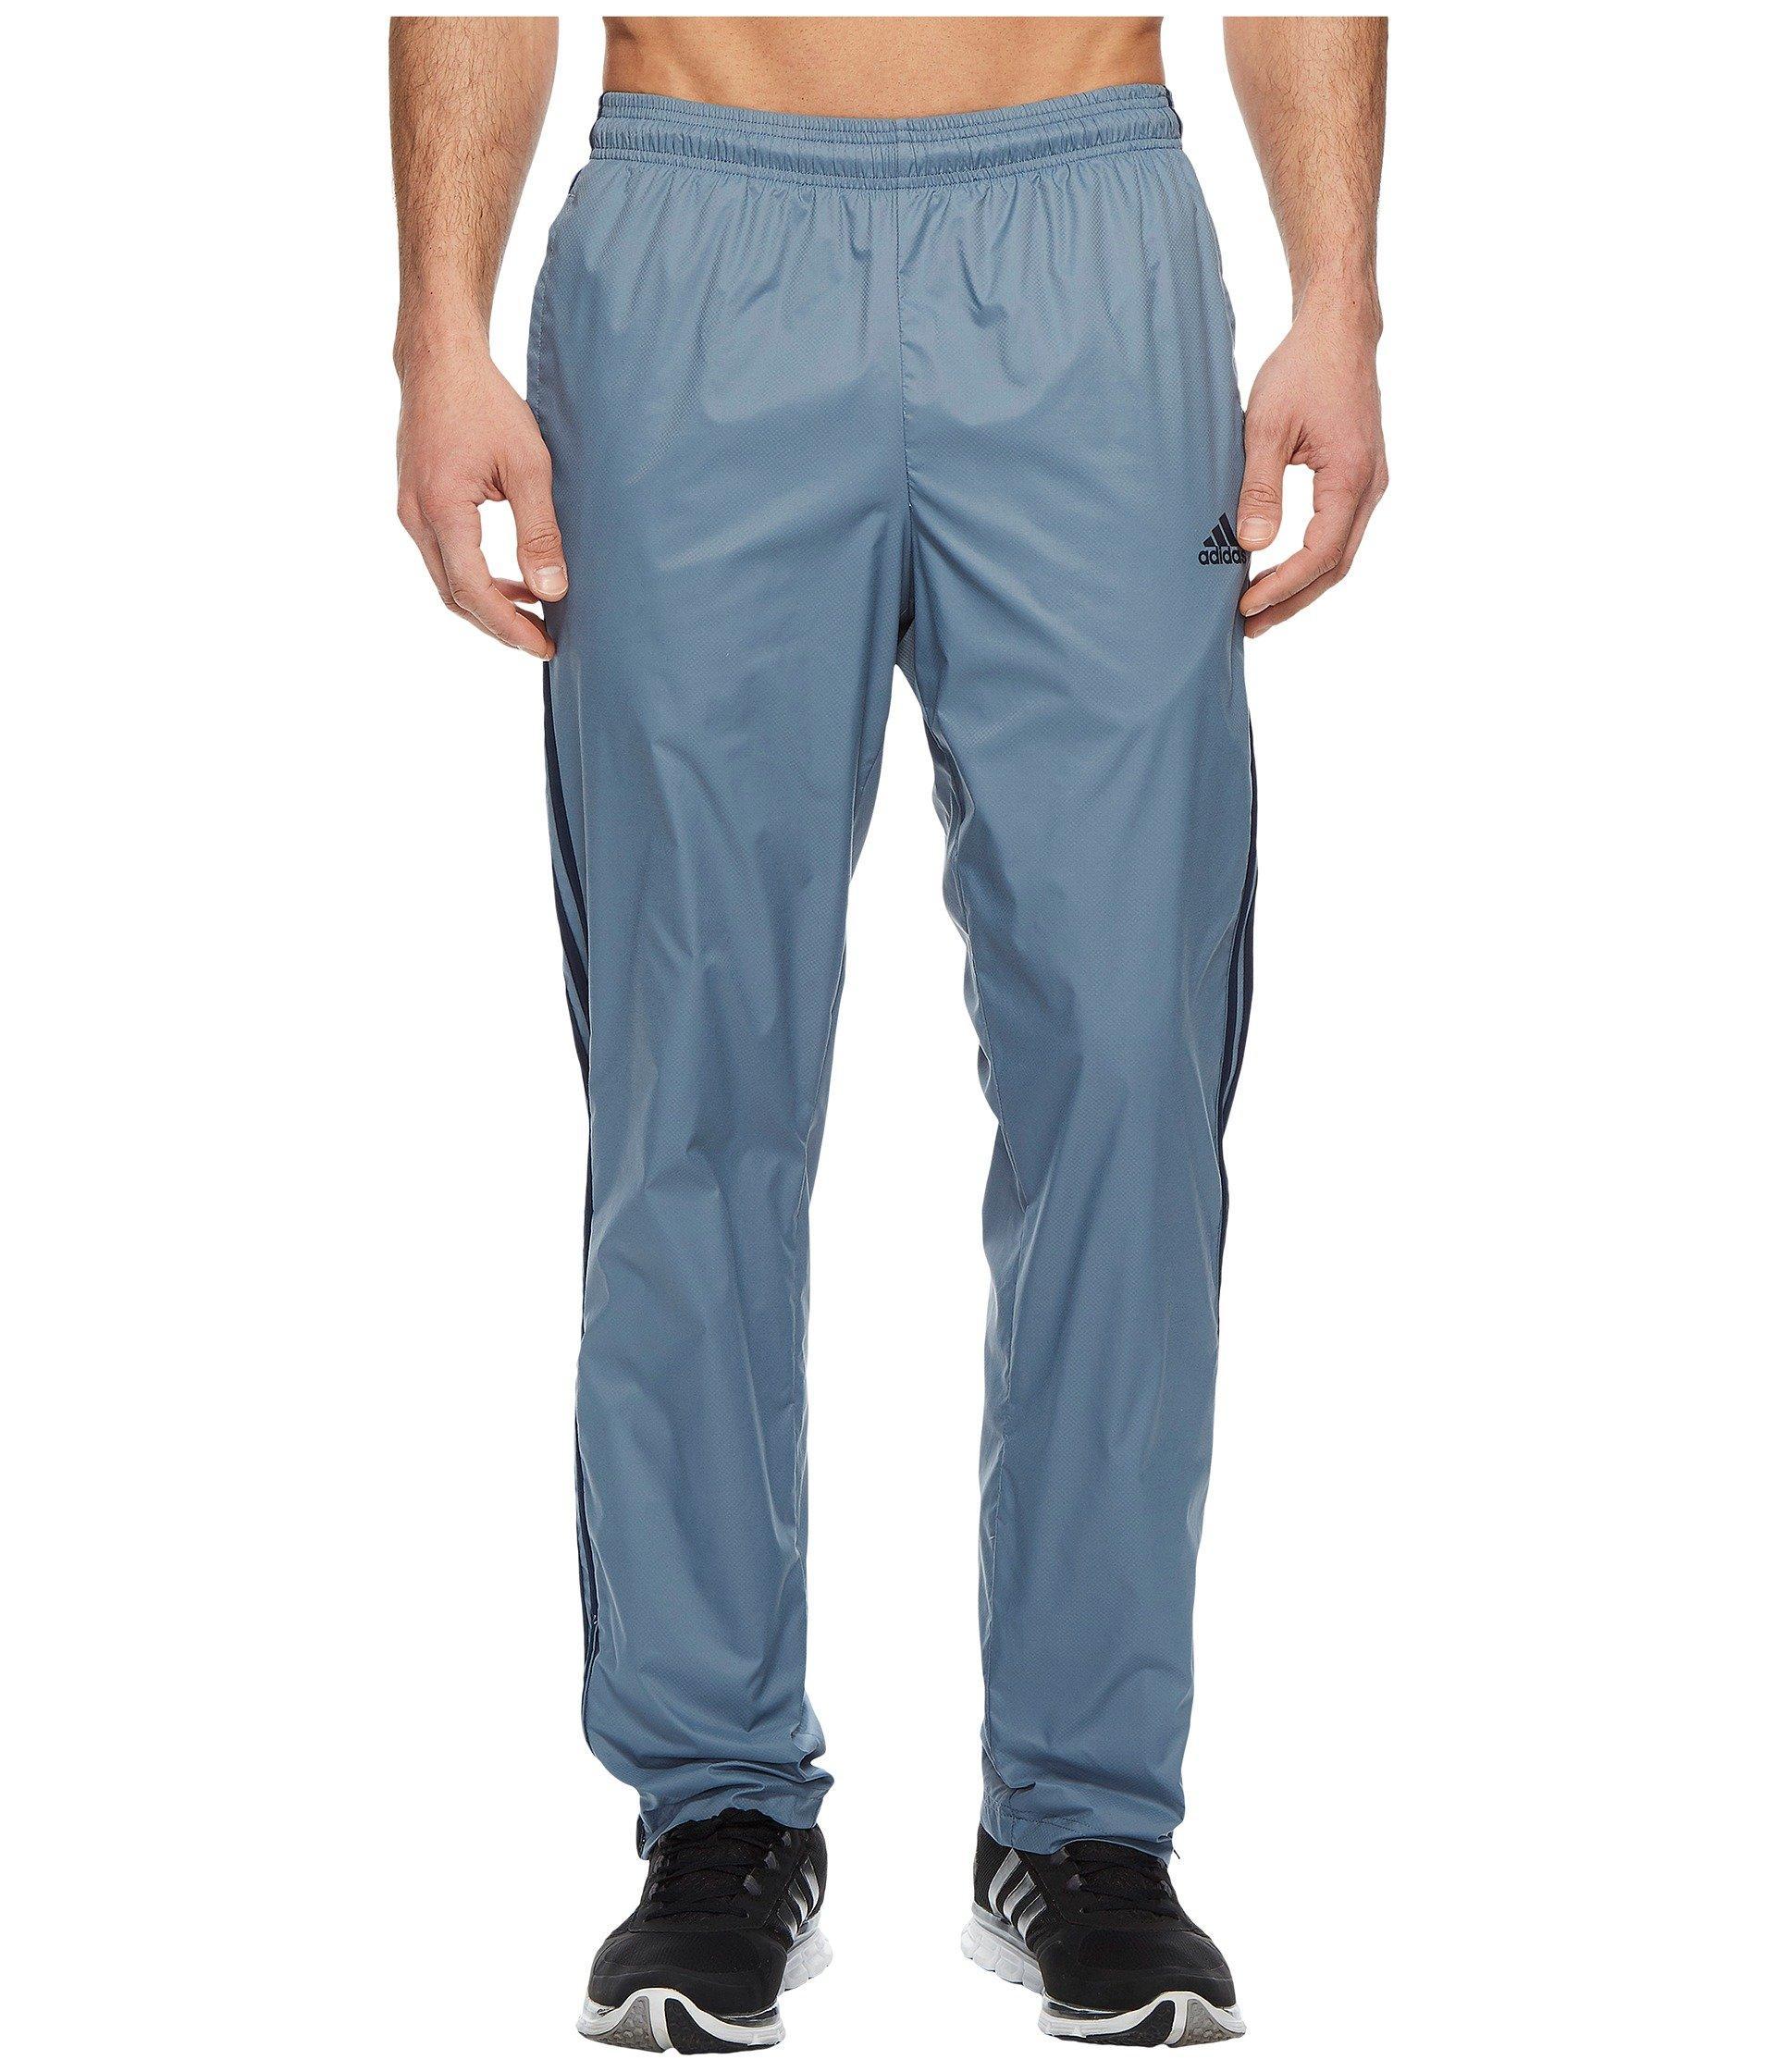 31a6e8a598fe ADIDAS ORIGINALS. Essentials 3S Wind Pants in Raw Steel Collegiate Navy